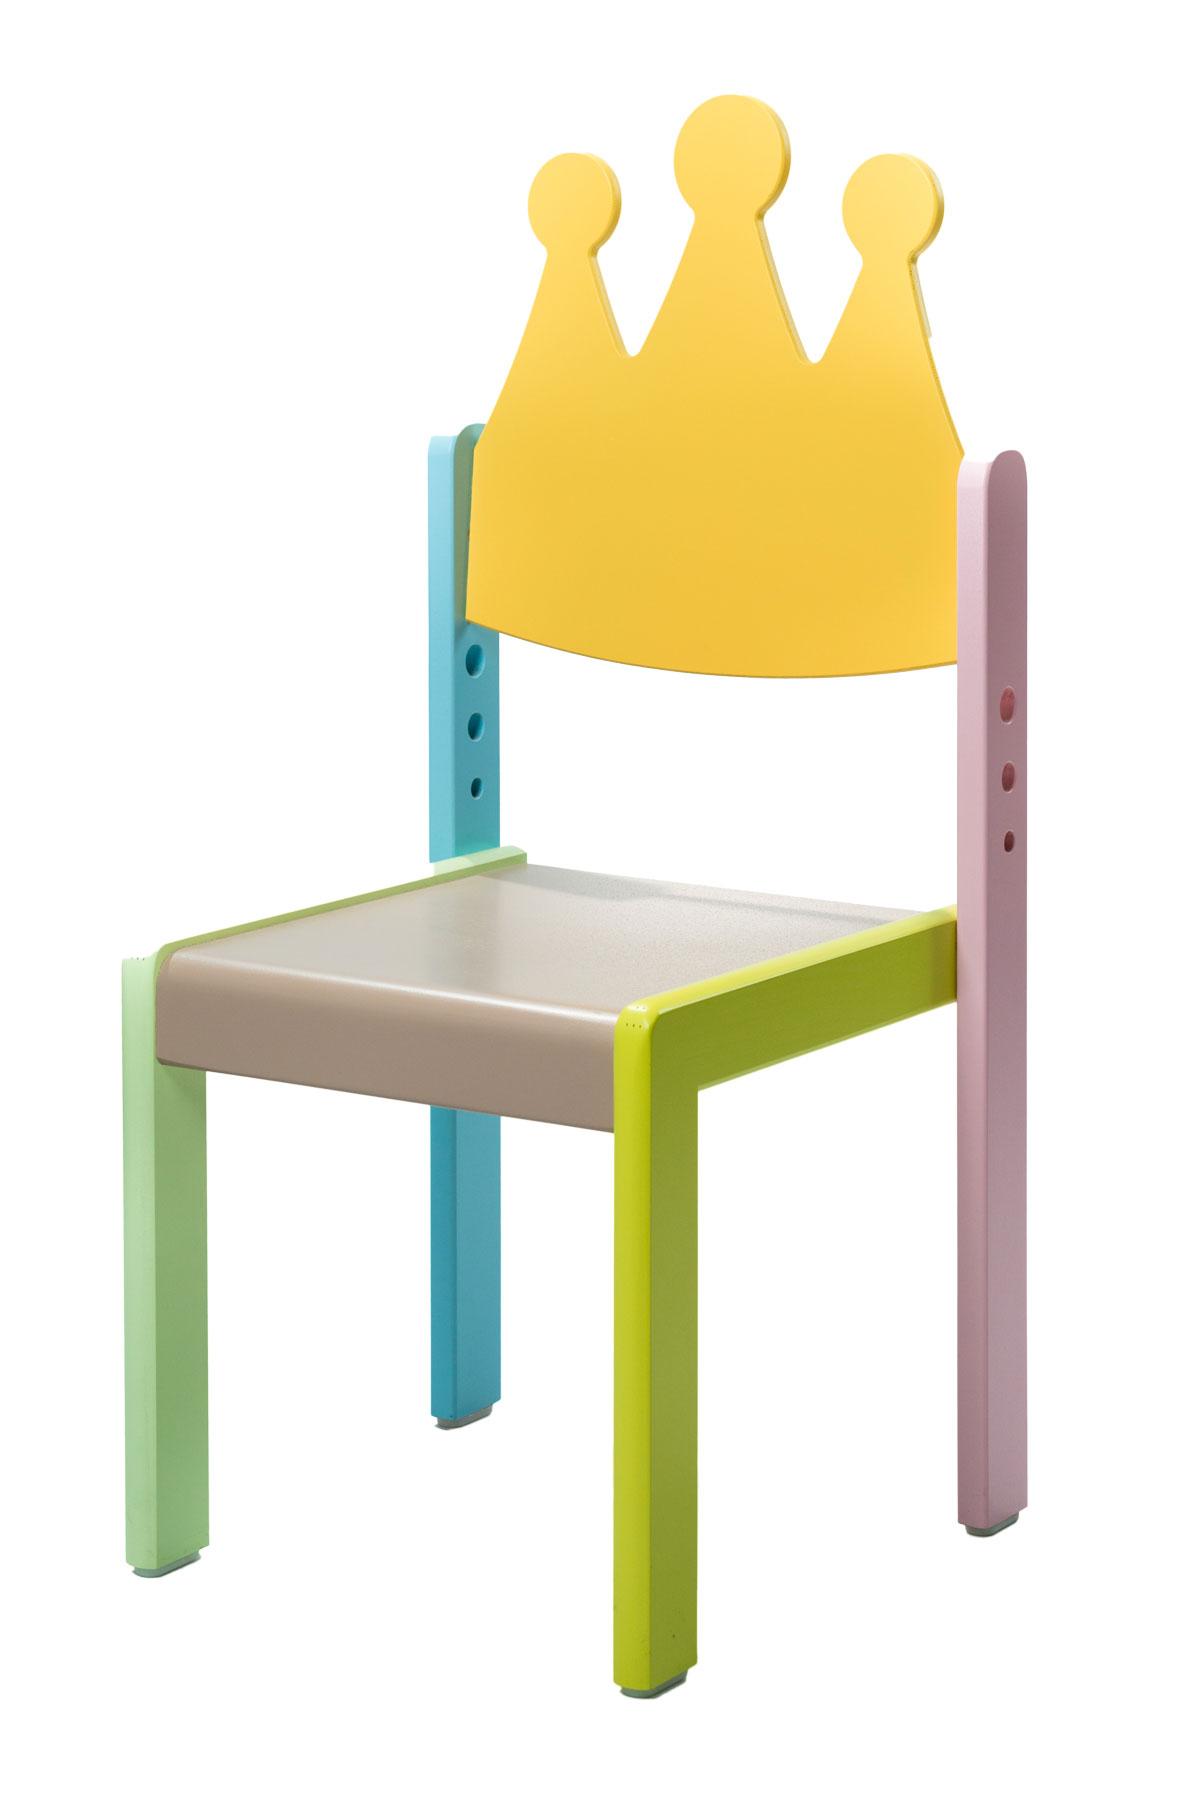 geburtstagsstuhl f r kita oder kindergarten kita. Black Bedroom Furniture Sets. Home Design Ideas